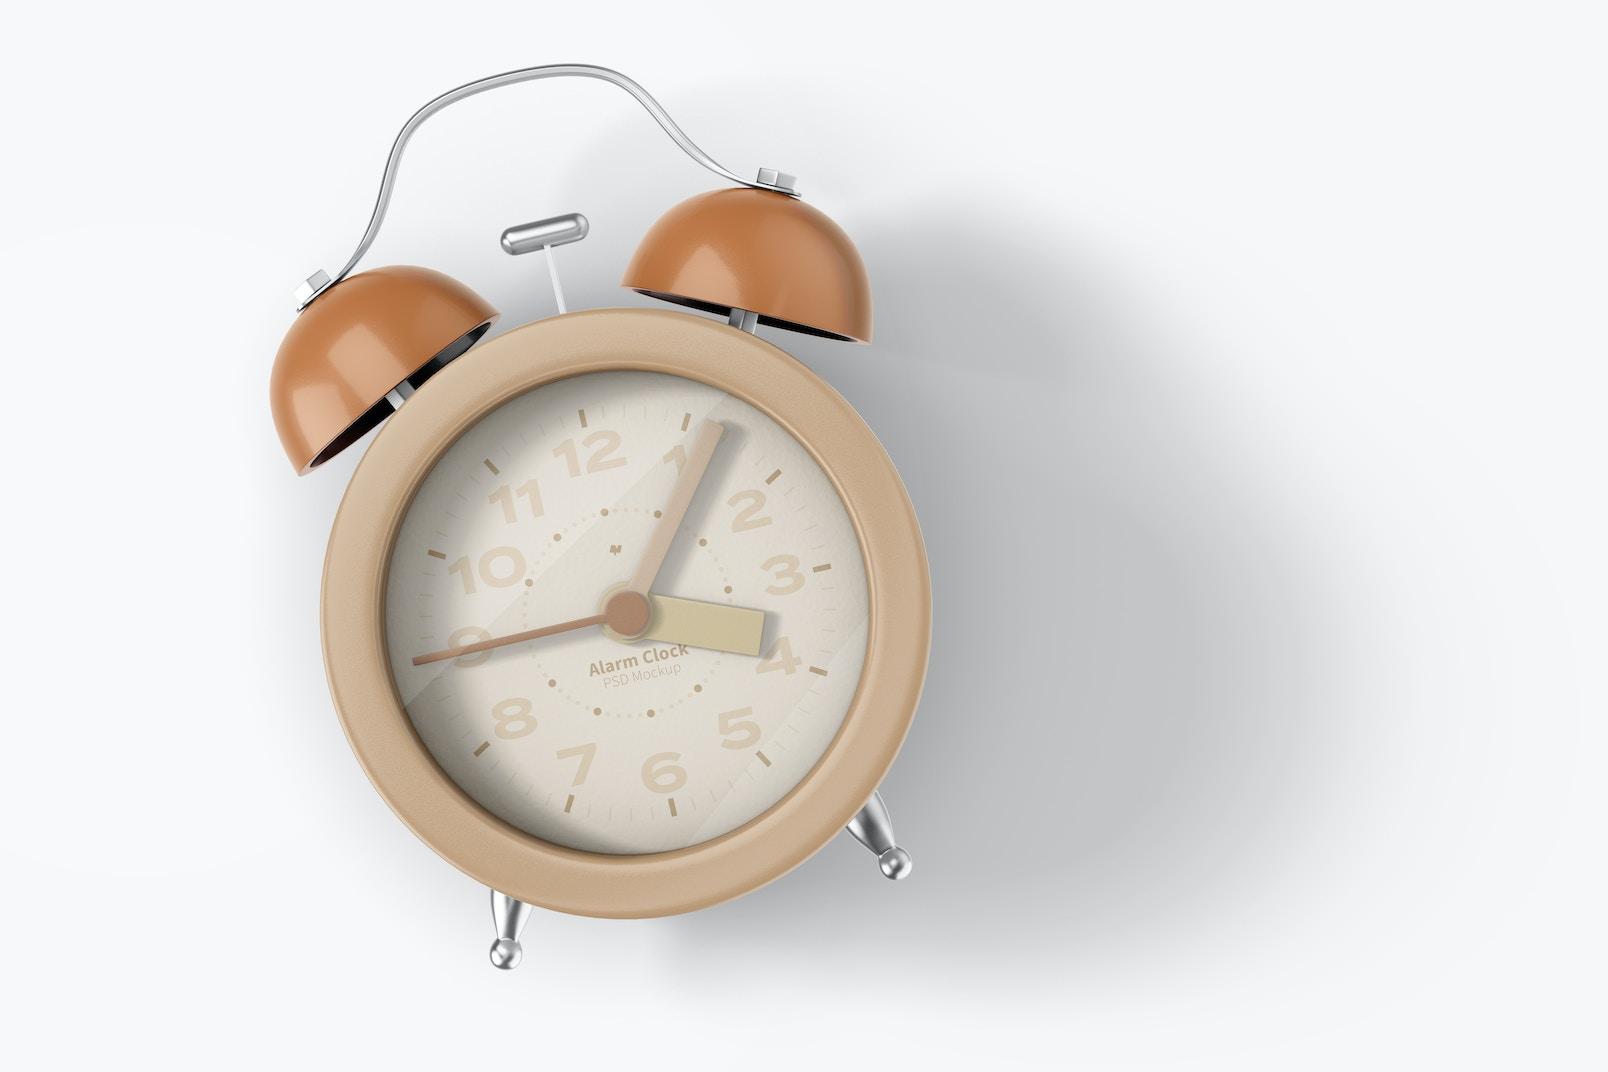 Alarm Clock Mockup, Top View